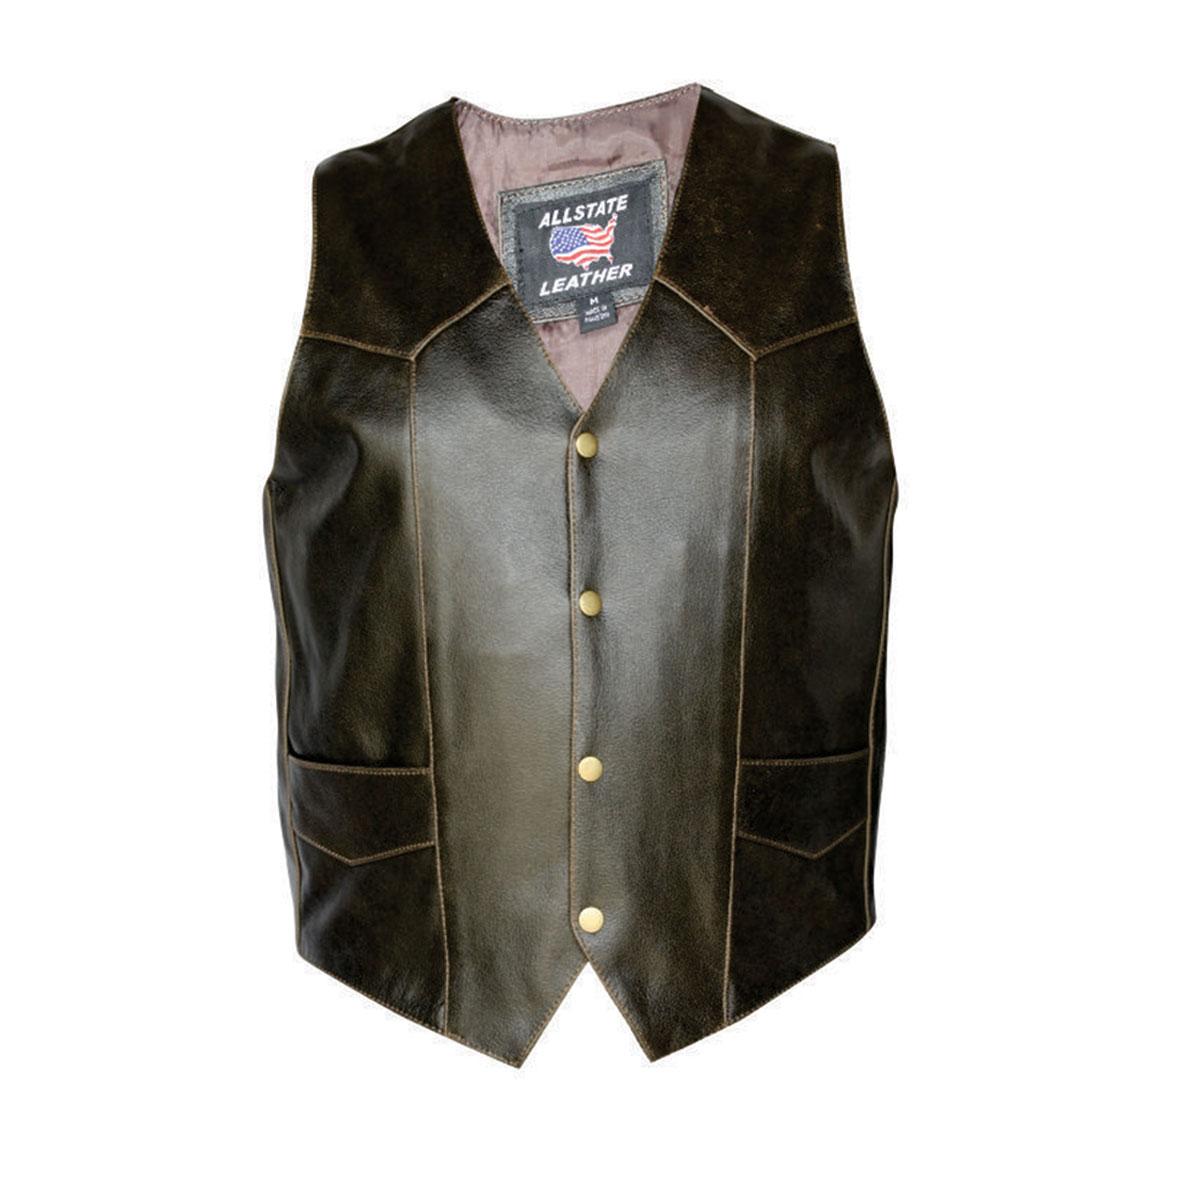 Allstate Leather Inc. Men′s Retro Brown Leather Vest